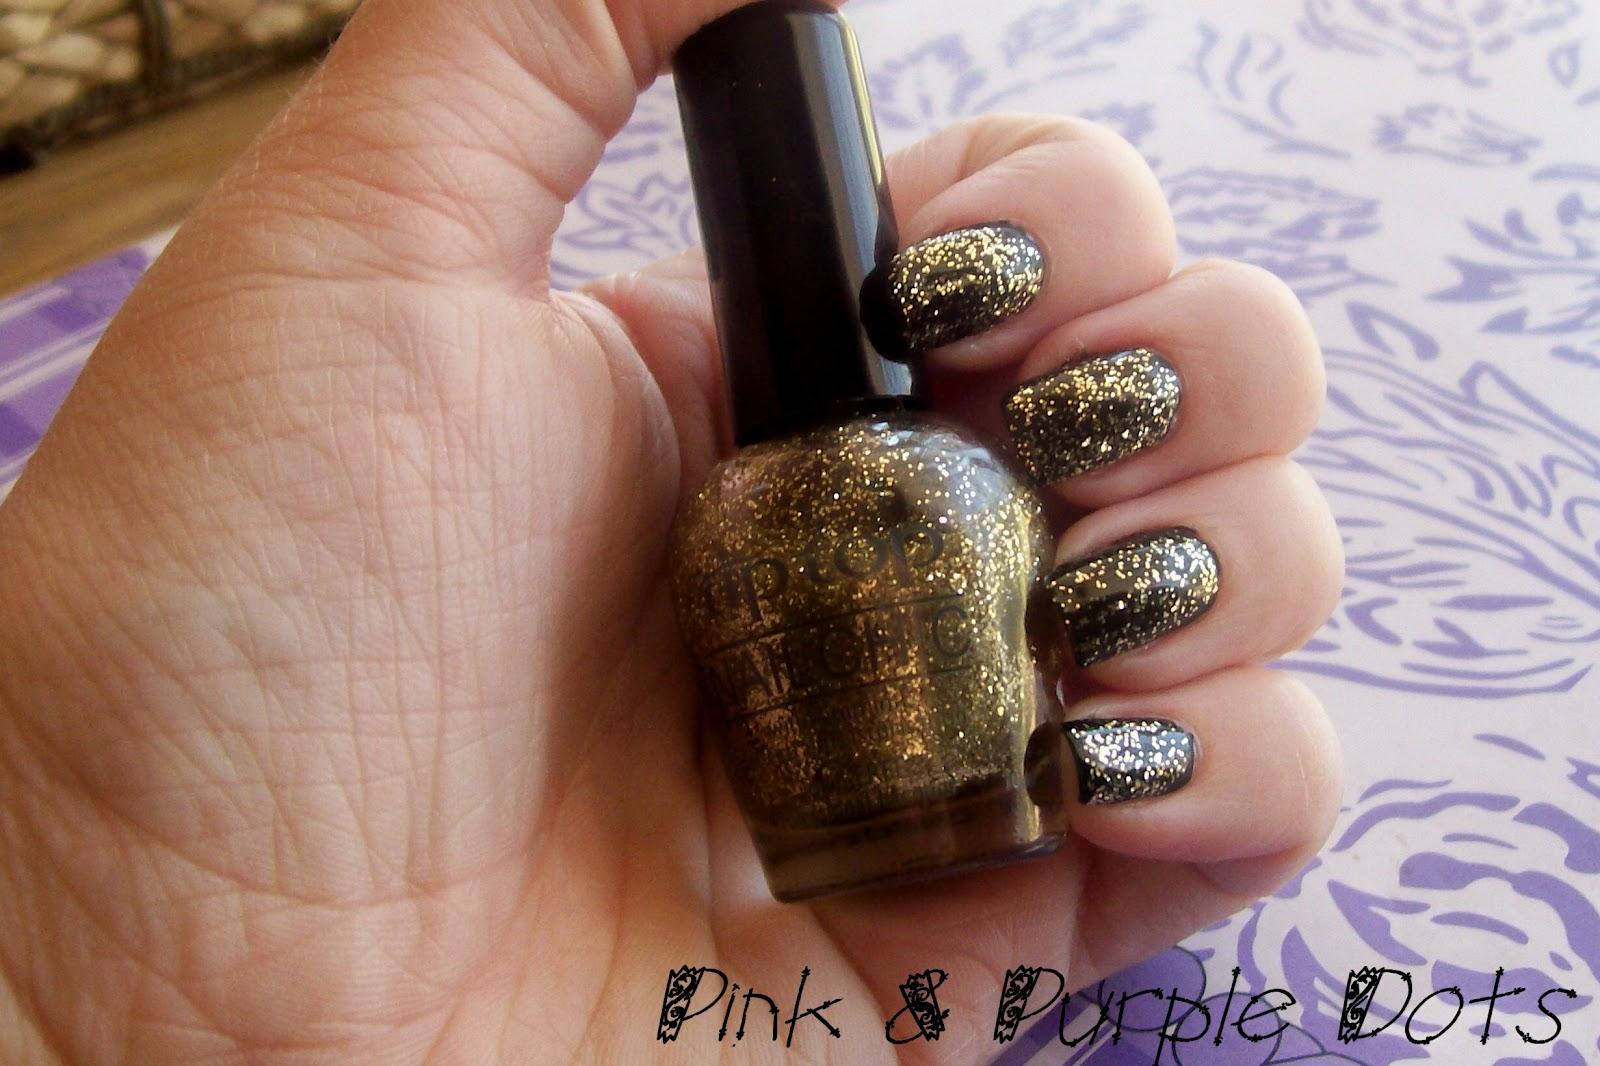 Pink & Purple Dots: Tip Top : Gold Drop Glitter